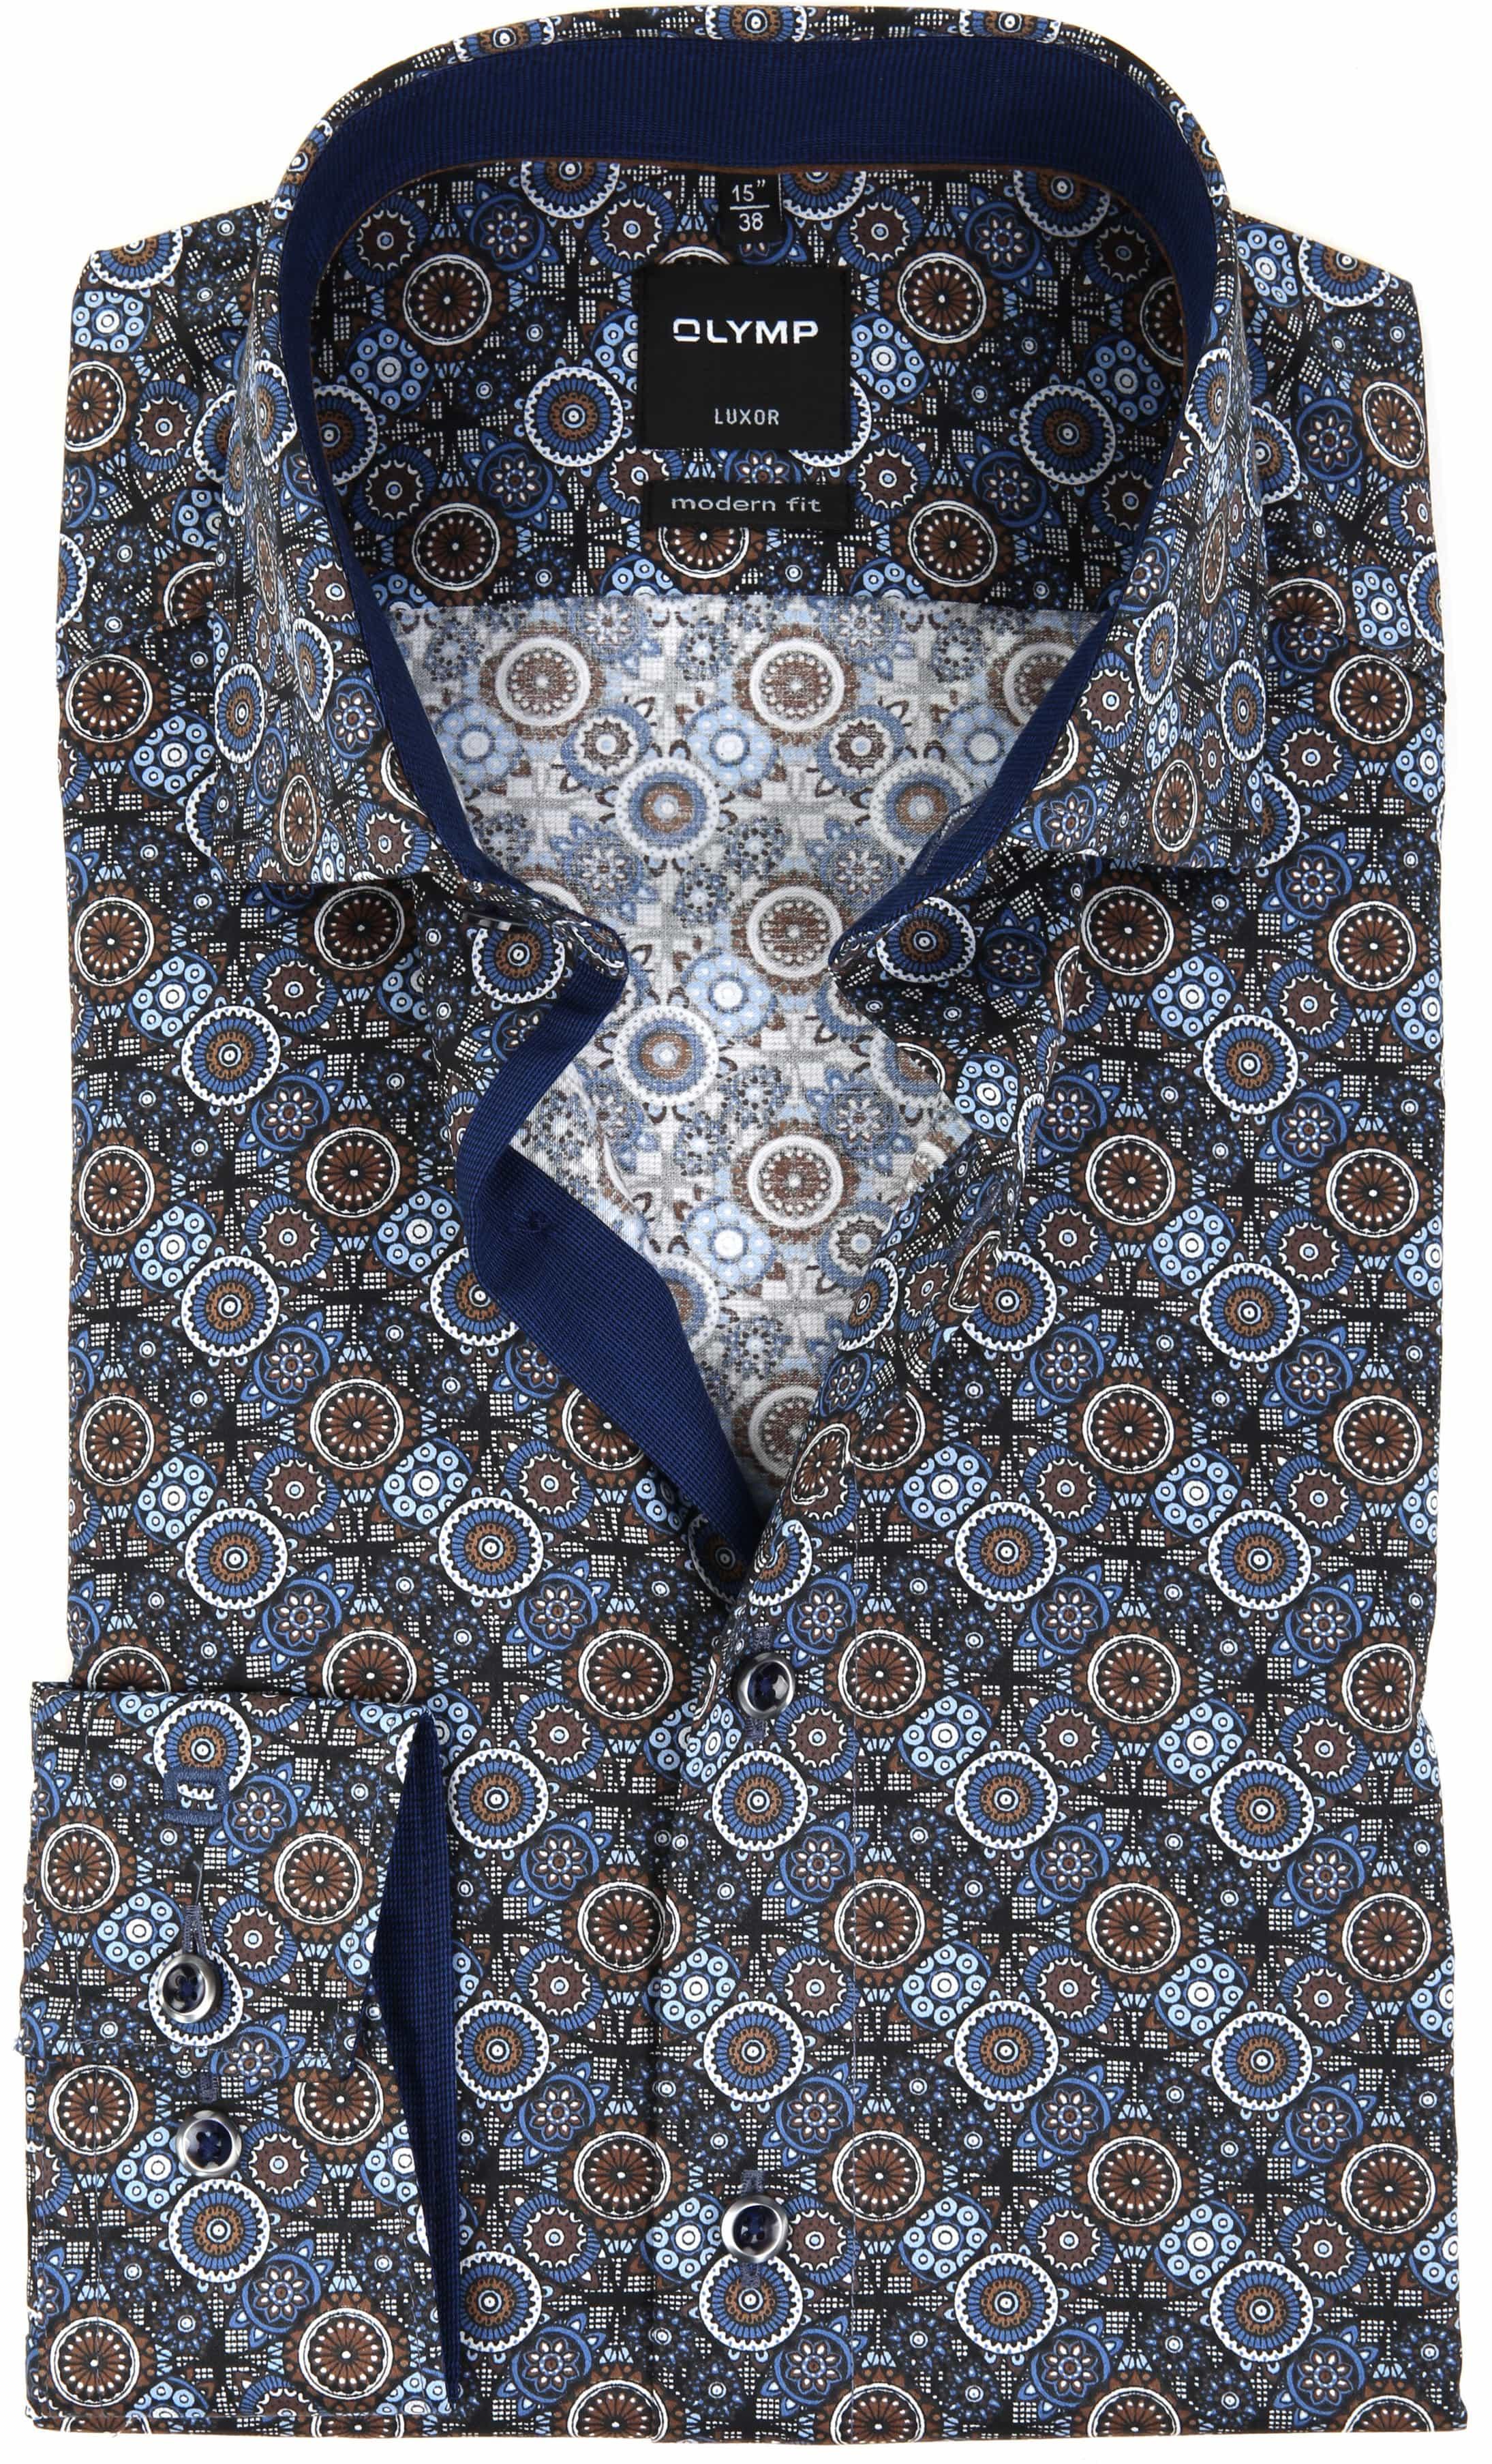 OLYMP Overhemd Luxor MF Print foto 0